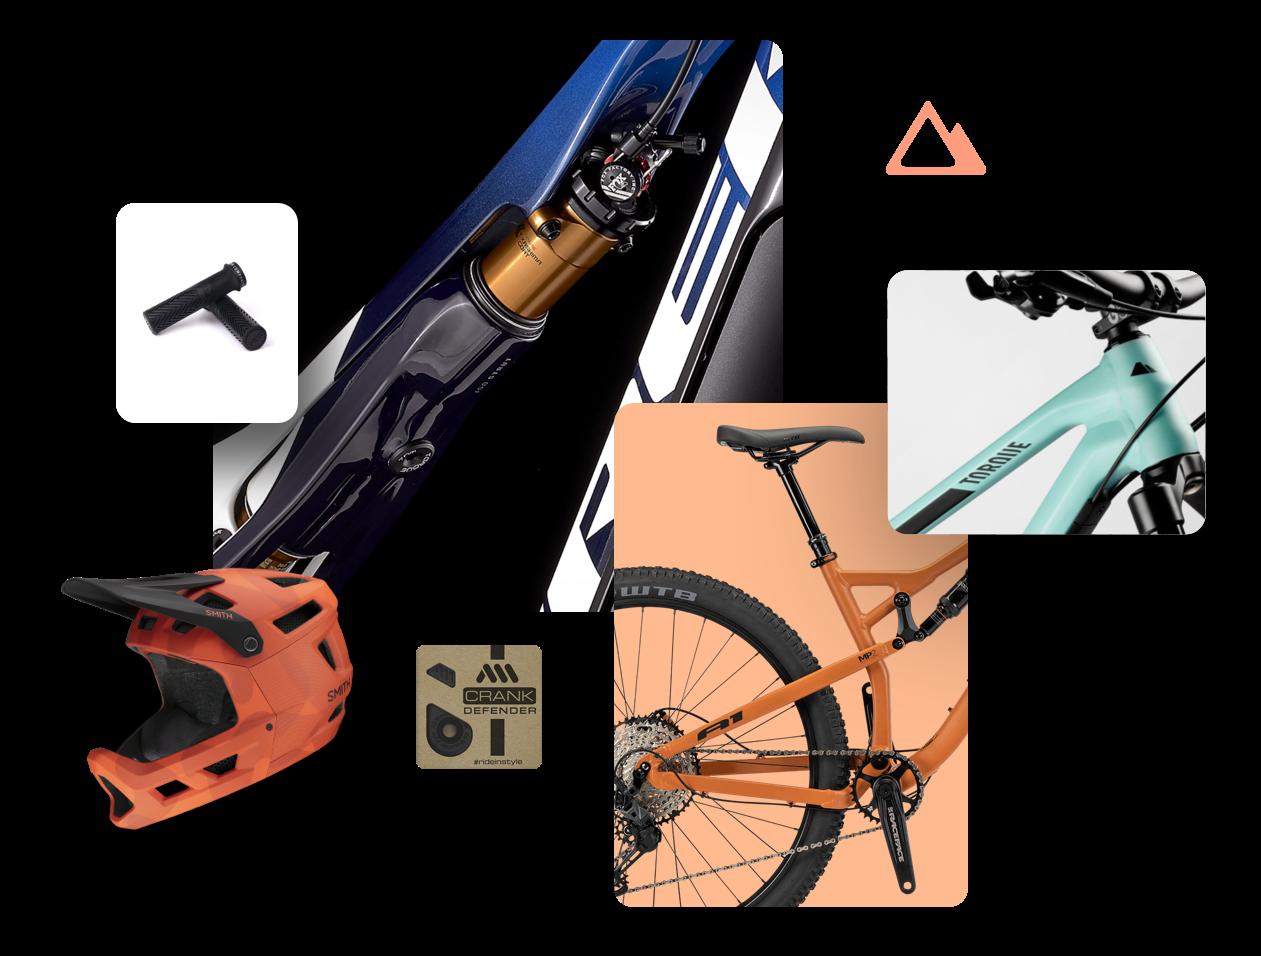 Mountain Bike Products